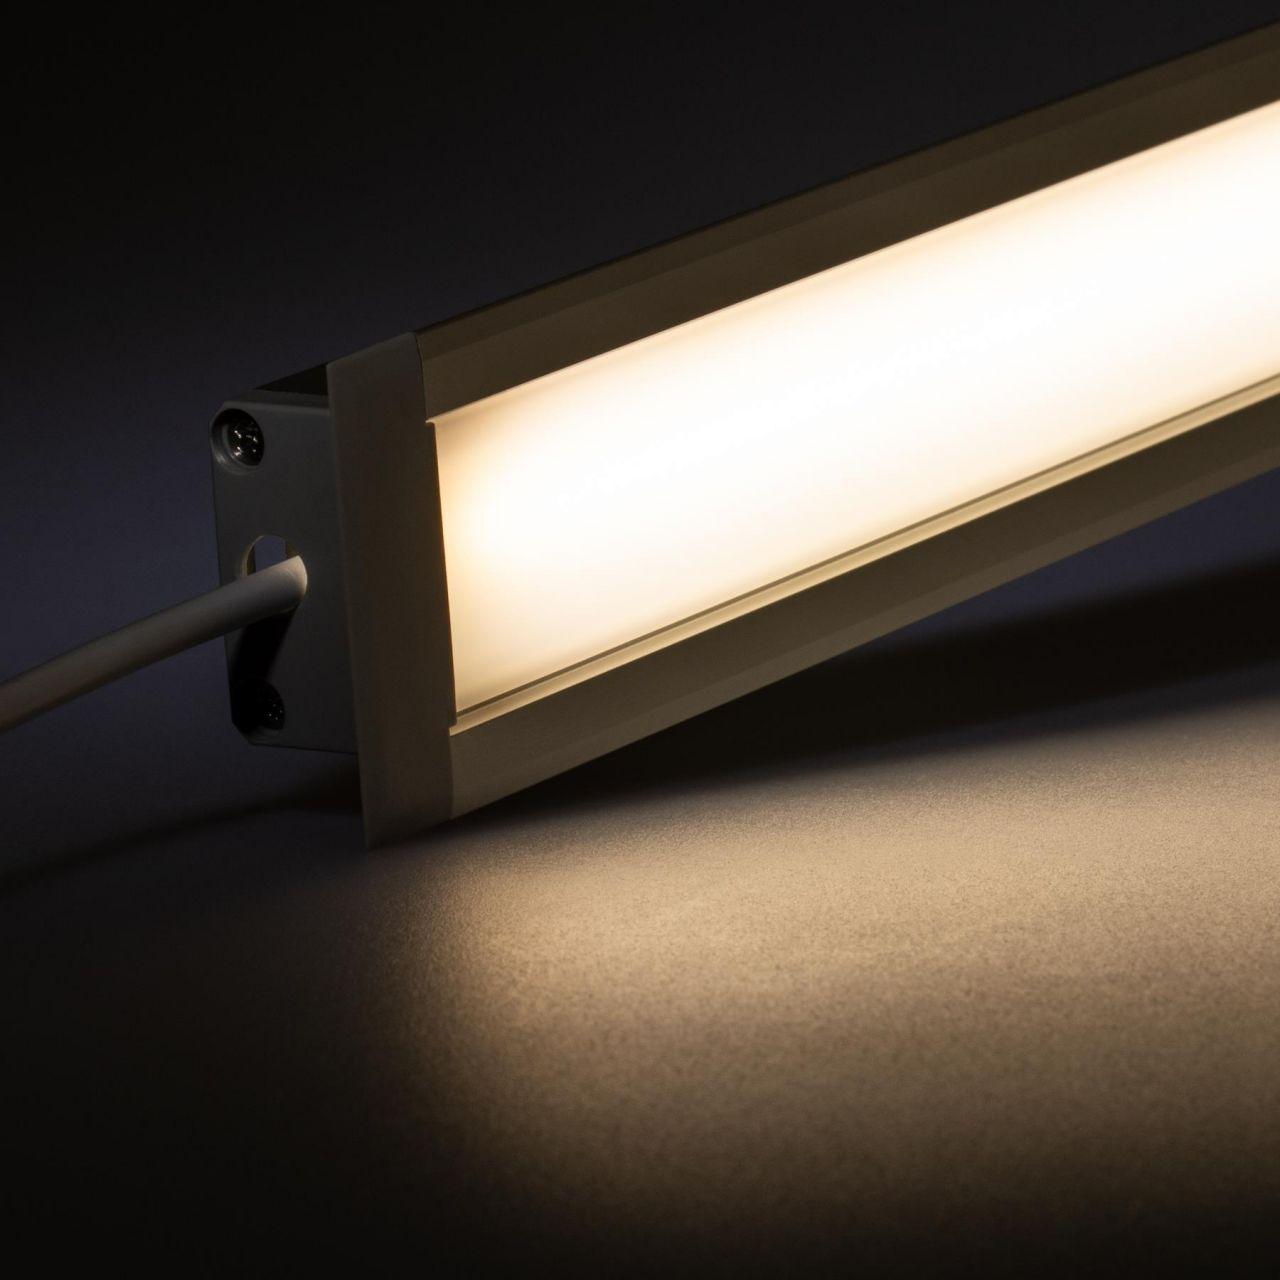 24V Aluminium Einbau LED Leiste – tageslichtweiß – diffuse Abdeckung